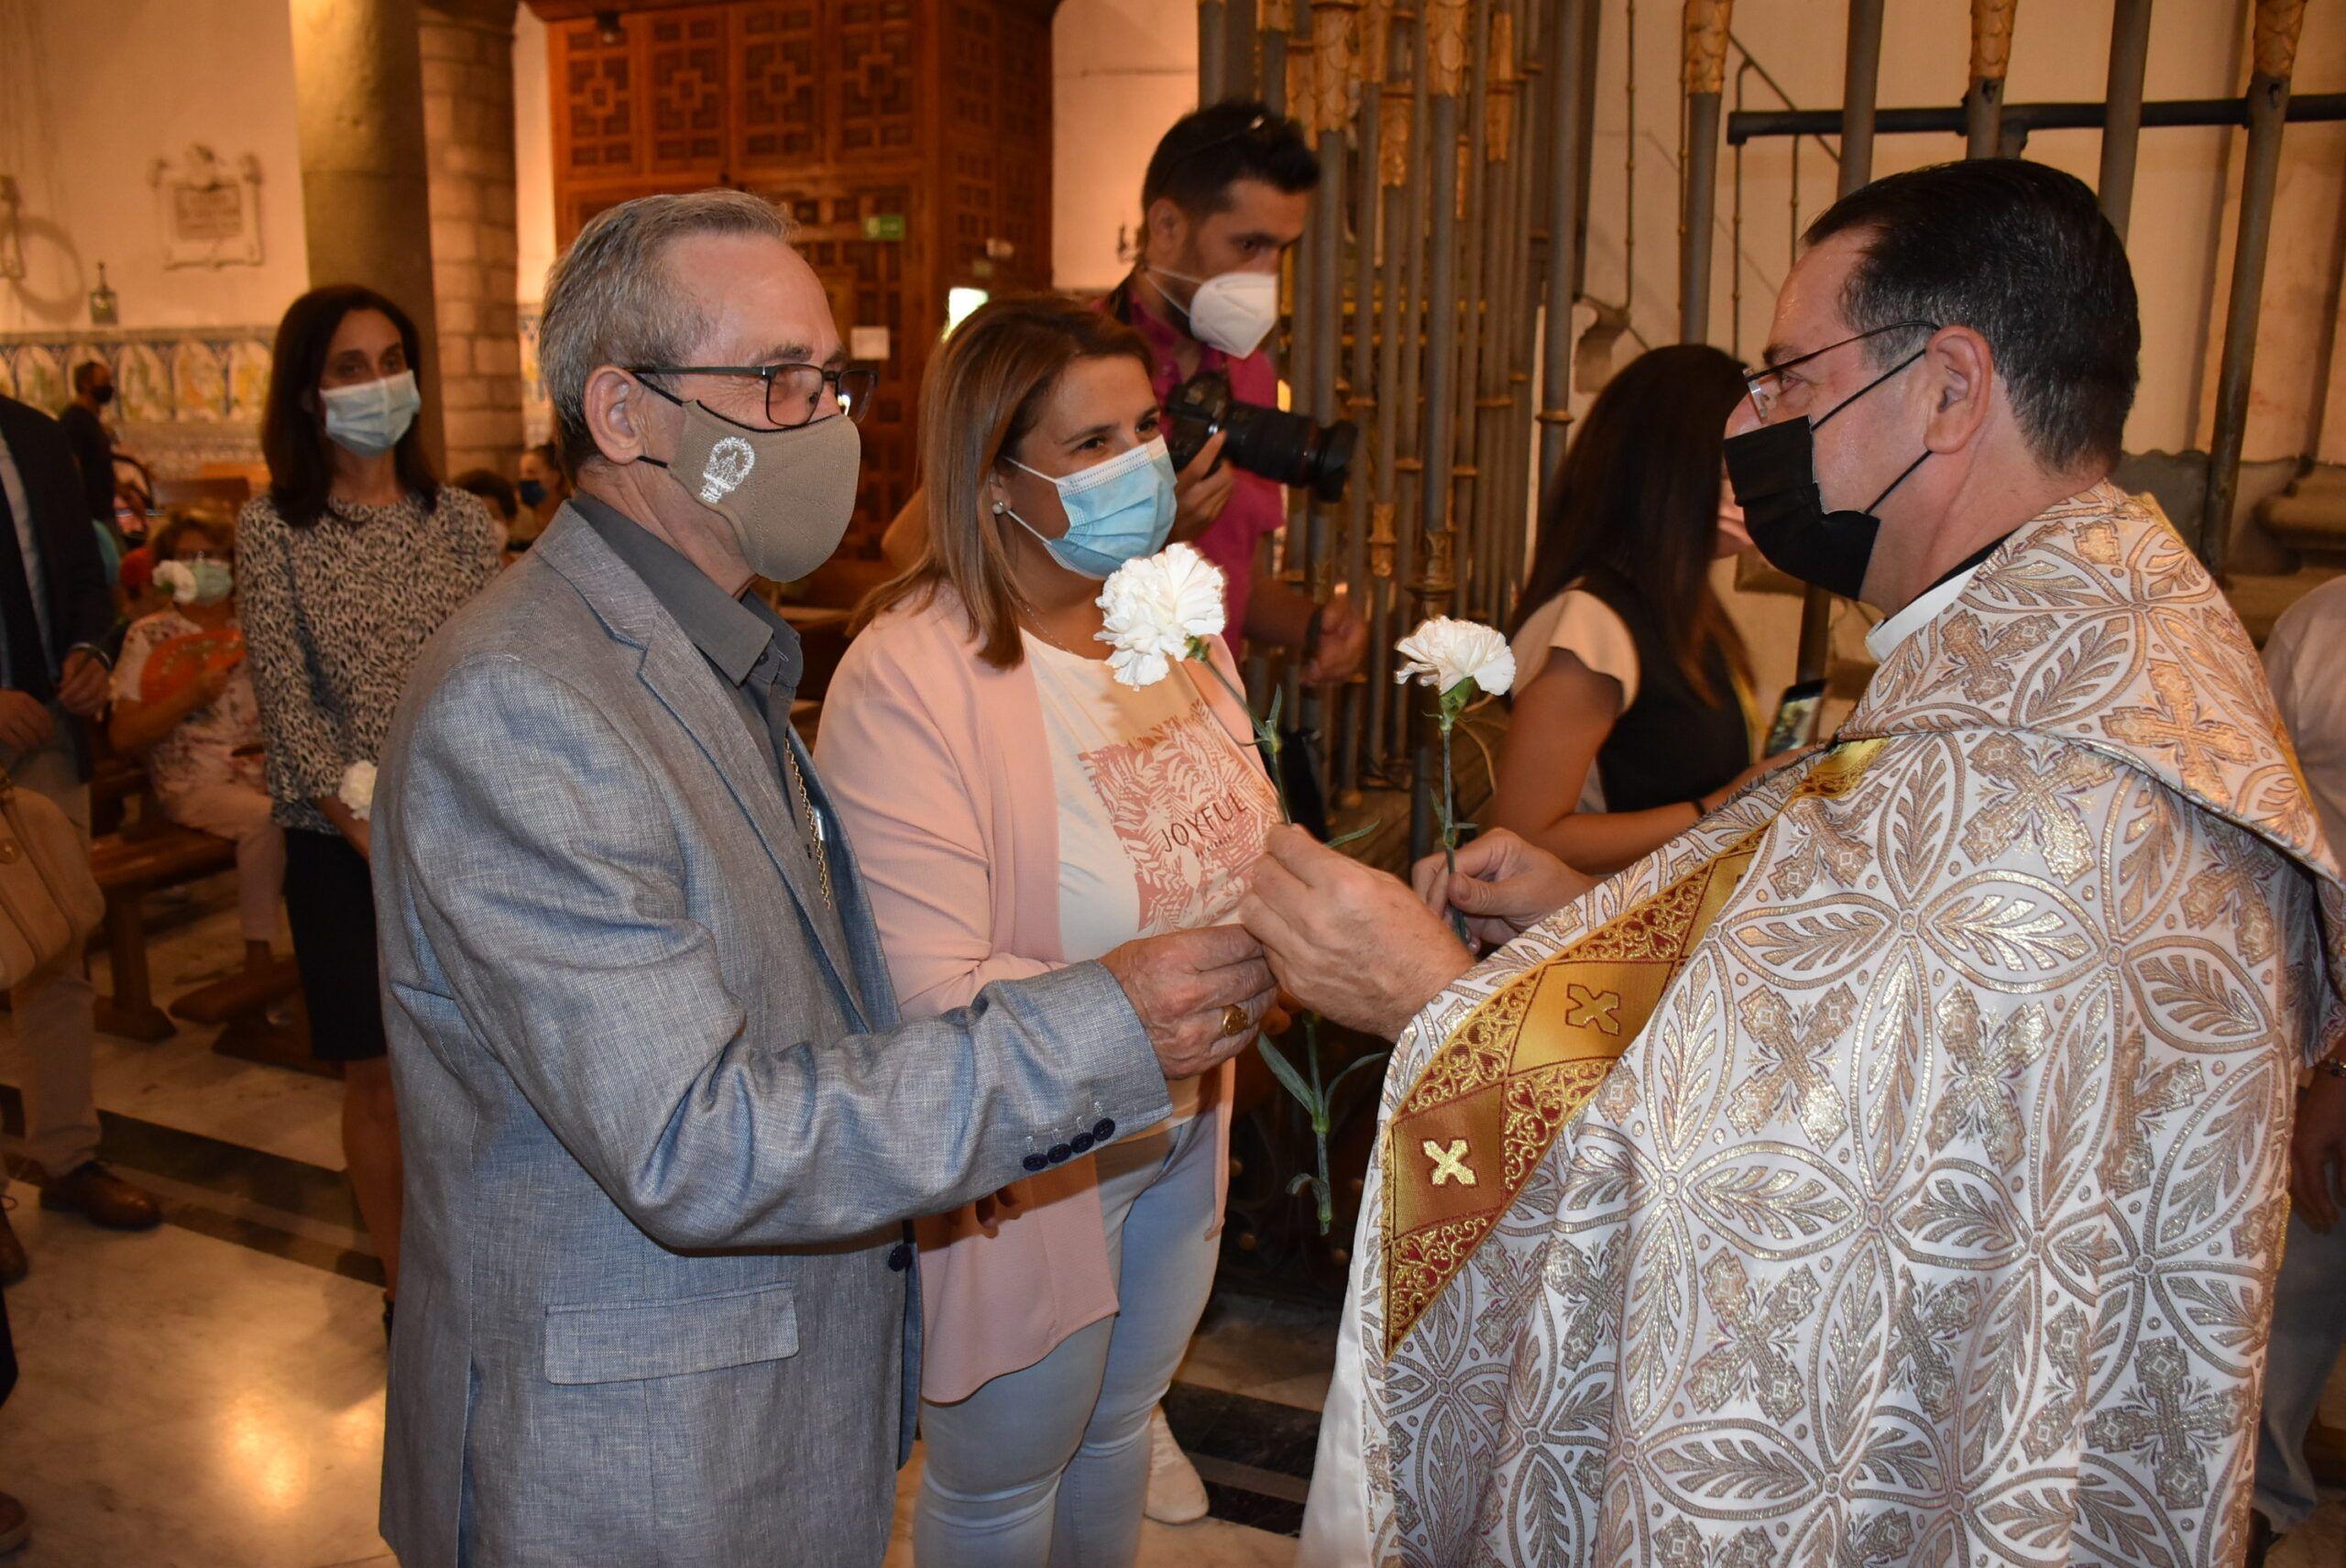 La alcaldesa participa en la ofrenda floral a la Patrona Perpetua de Talavera de la Reina